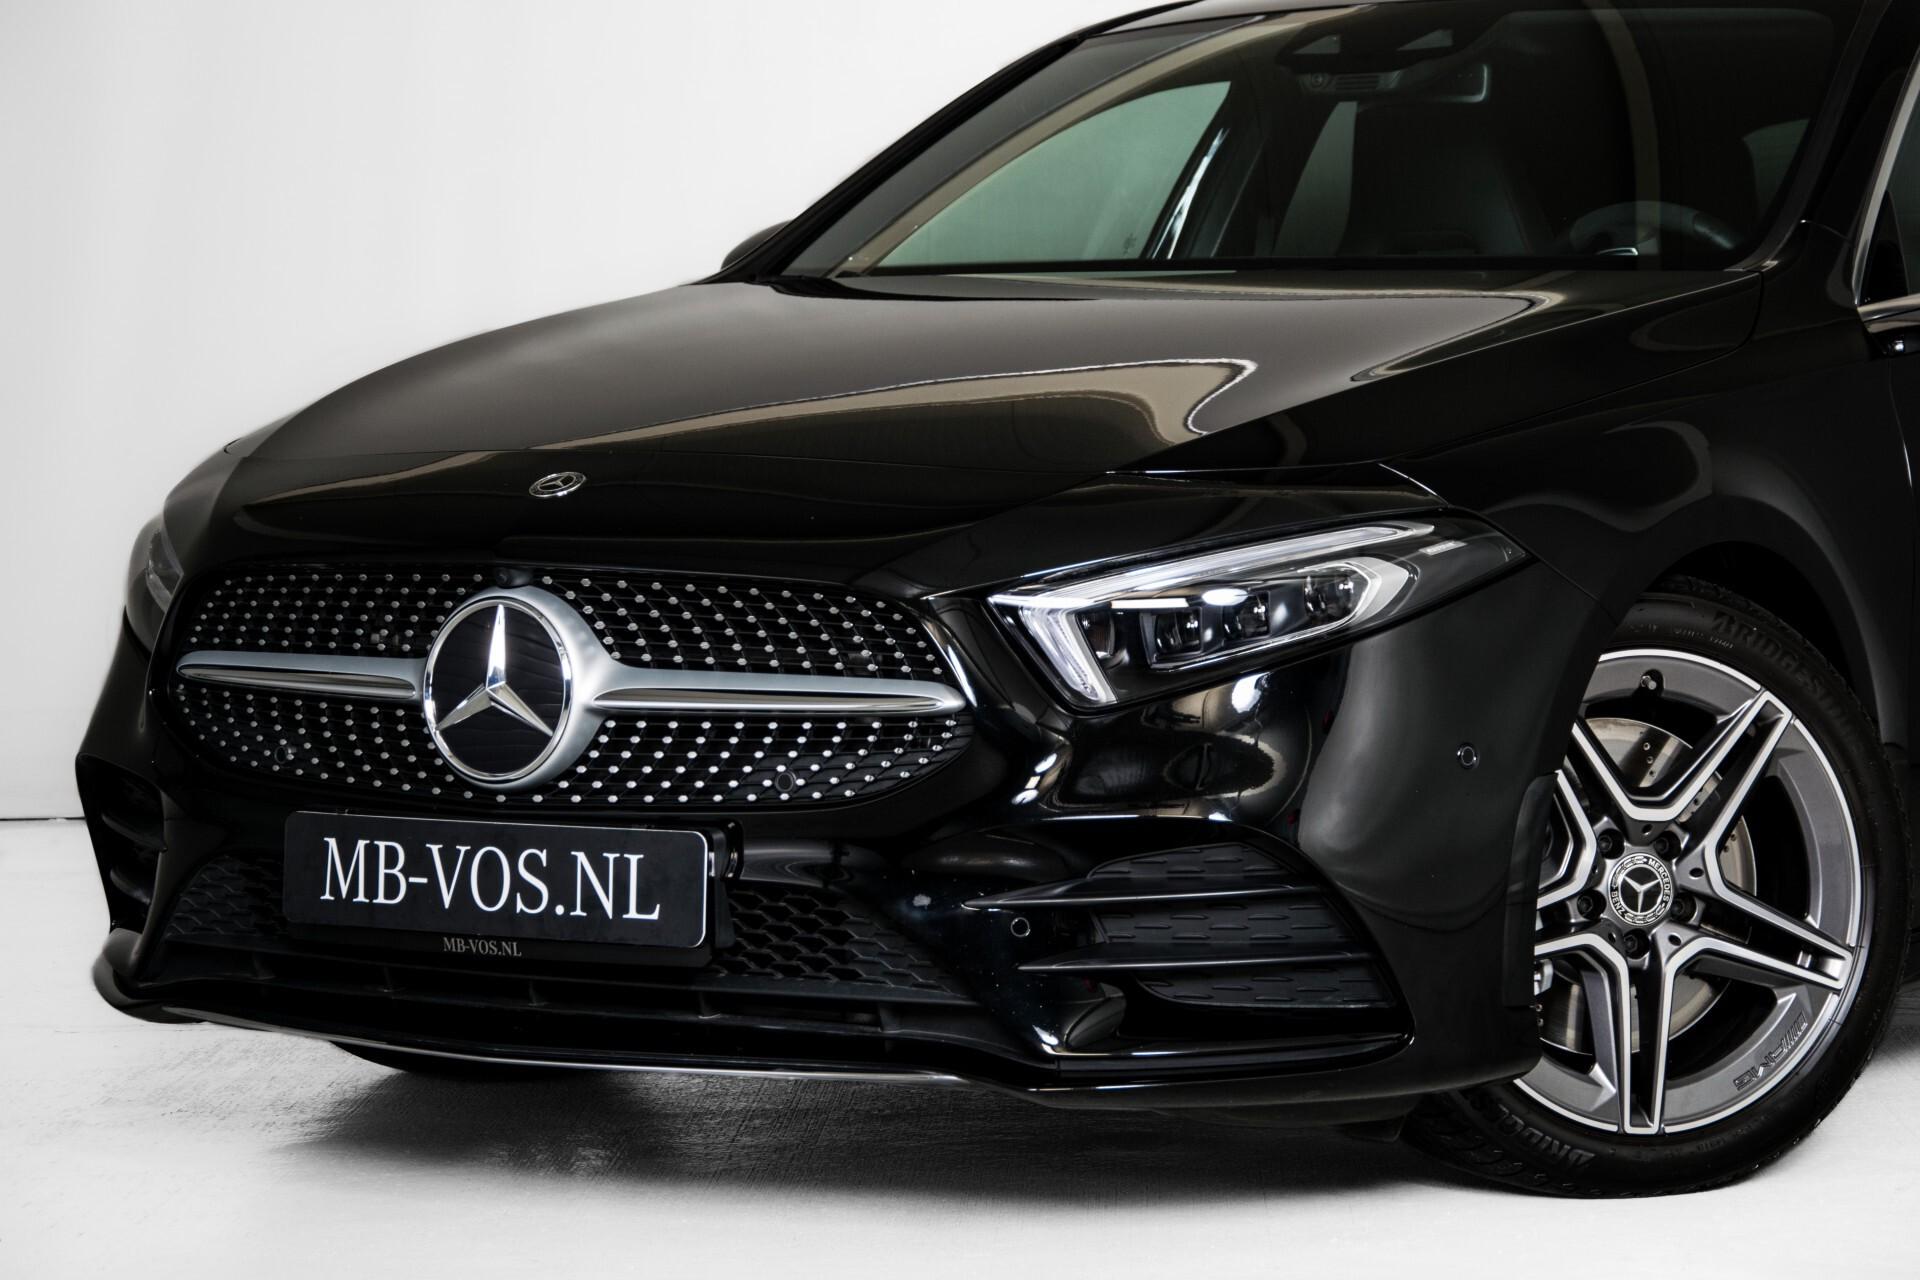 Mercedes-Benz A-Klasse 250 4-M AMG Panorama/Keyless-Entry/MBUX/HUD/Burmester/360/Multibeam LED Aut7 Foto 53